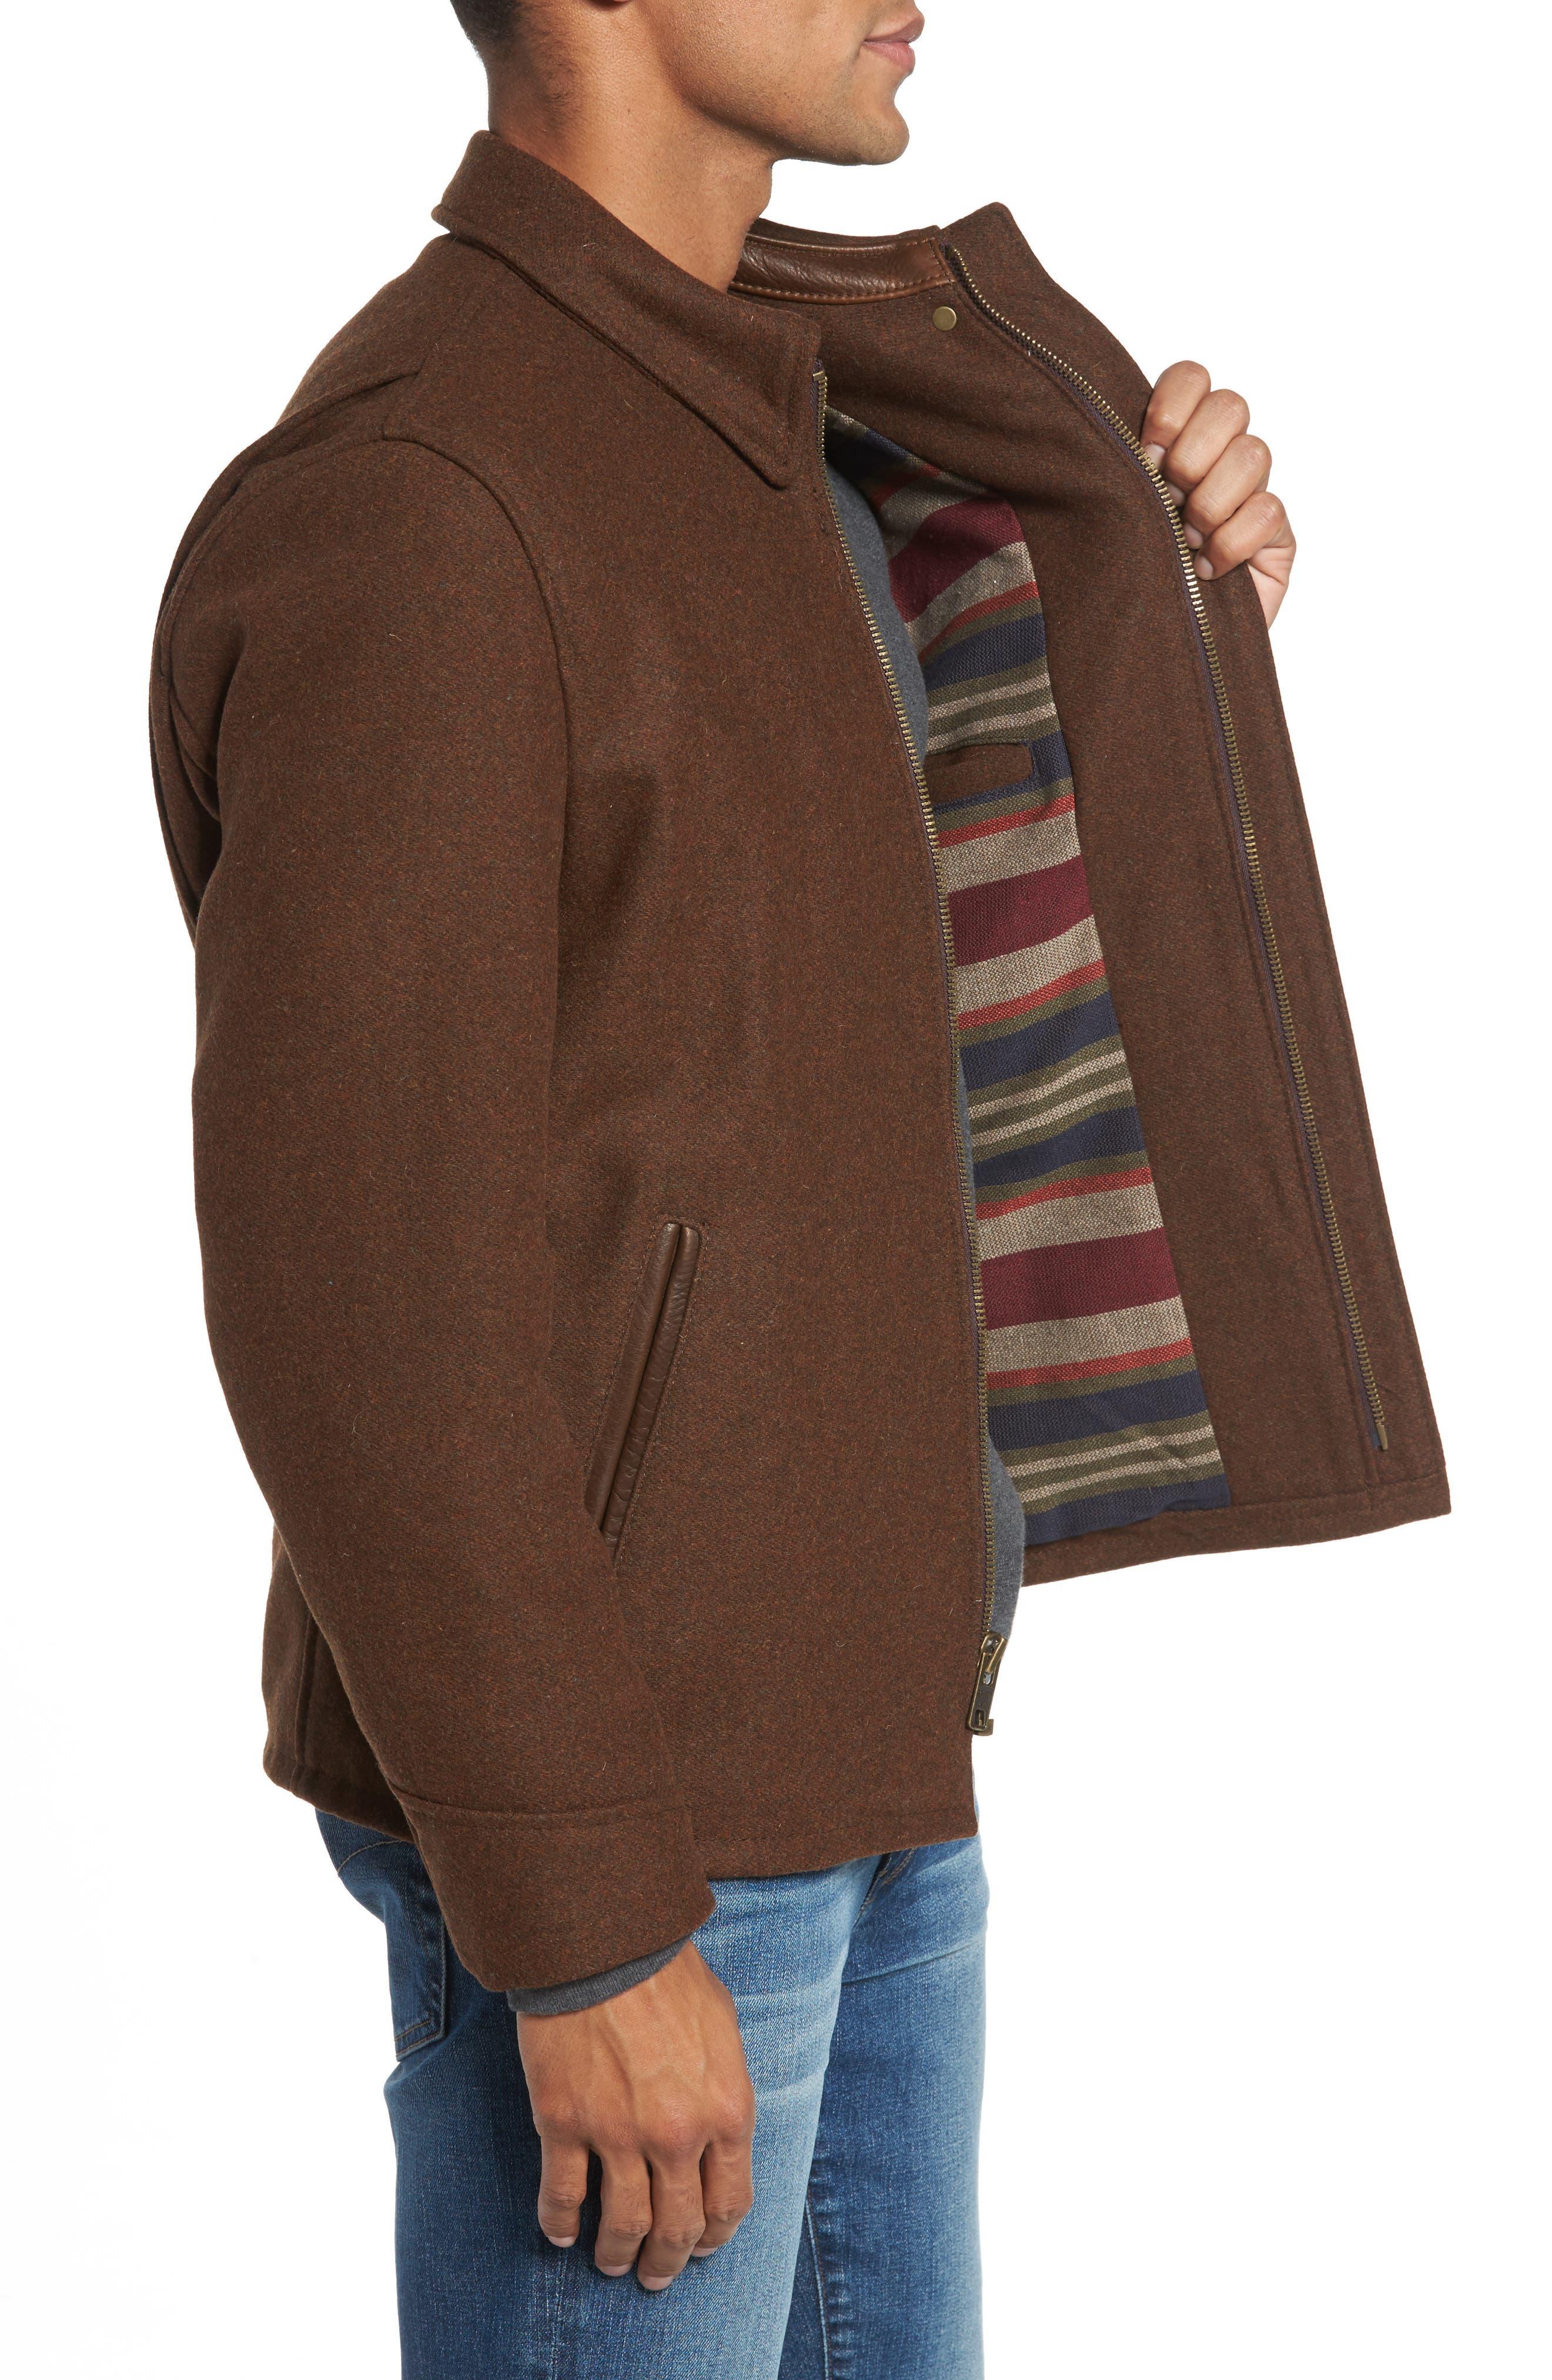 Liberty Wool Blend Zip Front Jacket,                             Alternate thumbnail 3, color,                             200